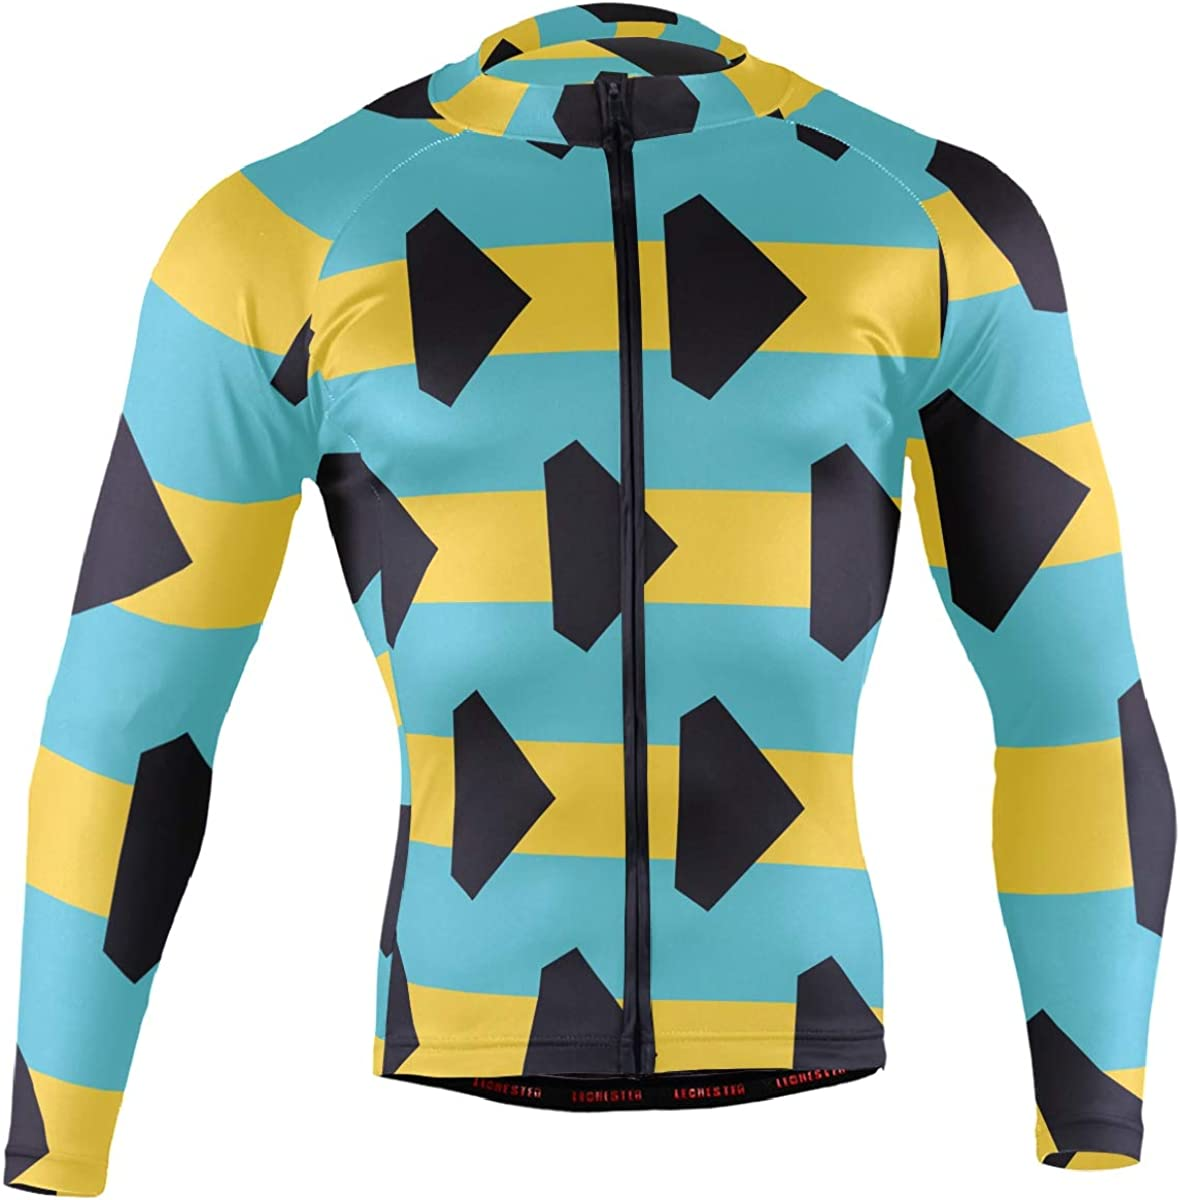 Bahamas Superlatite Flag Men's Long Sleeve Jersey Poc Bicycle specialty shop Jacket Cycling